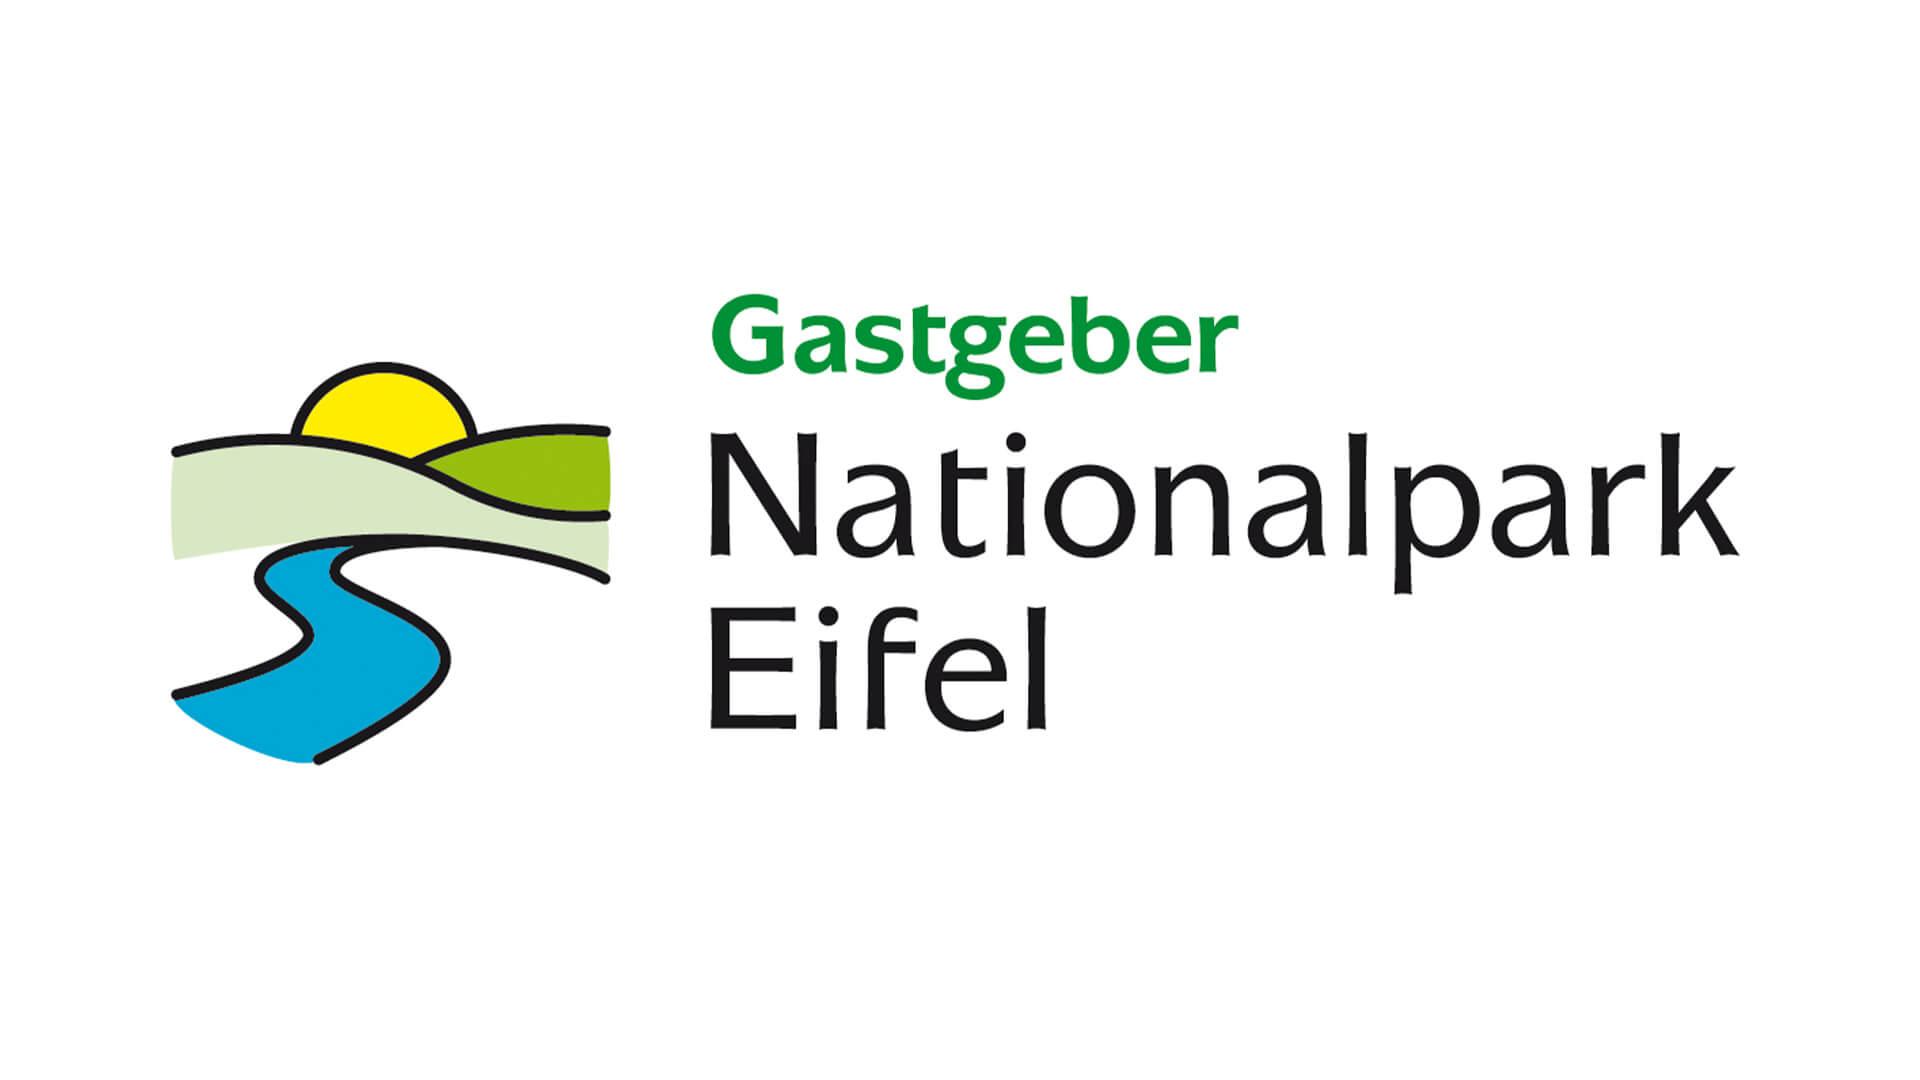 Nationalpark Eifel Gastgeber